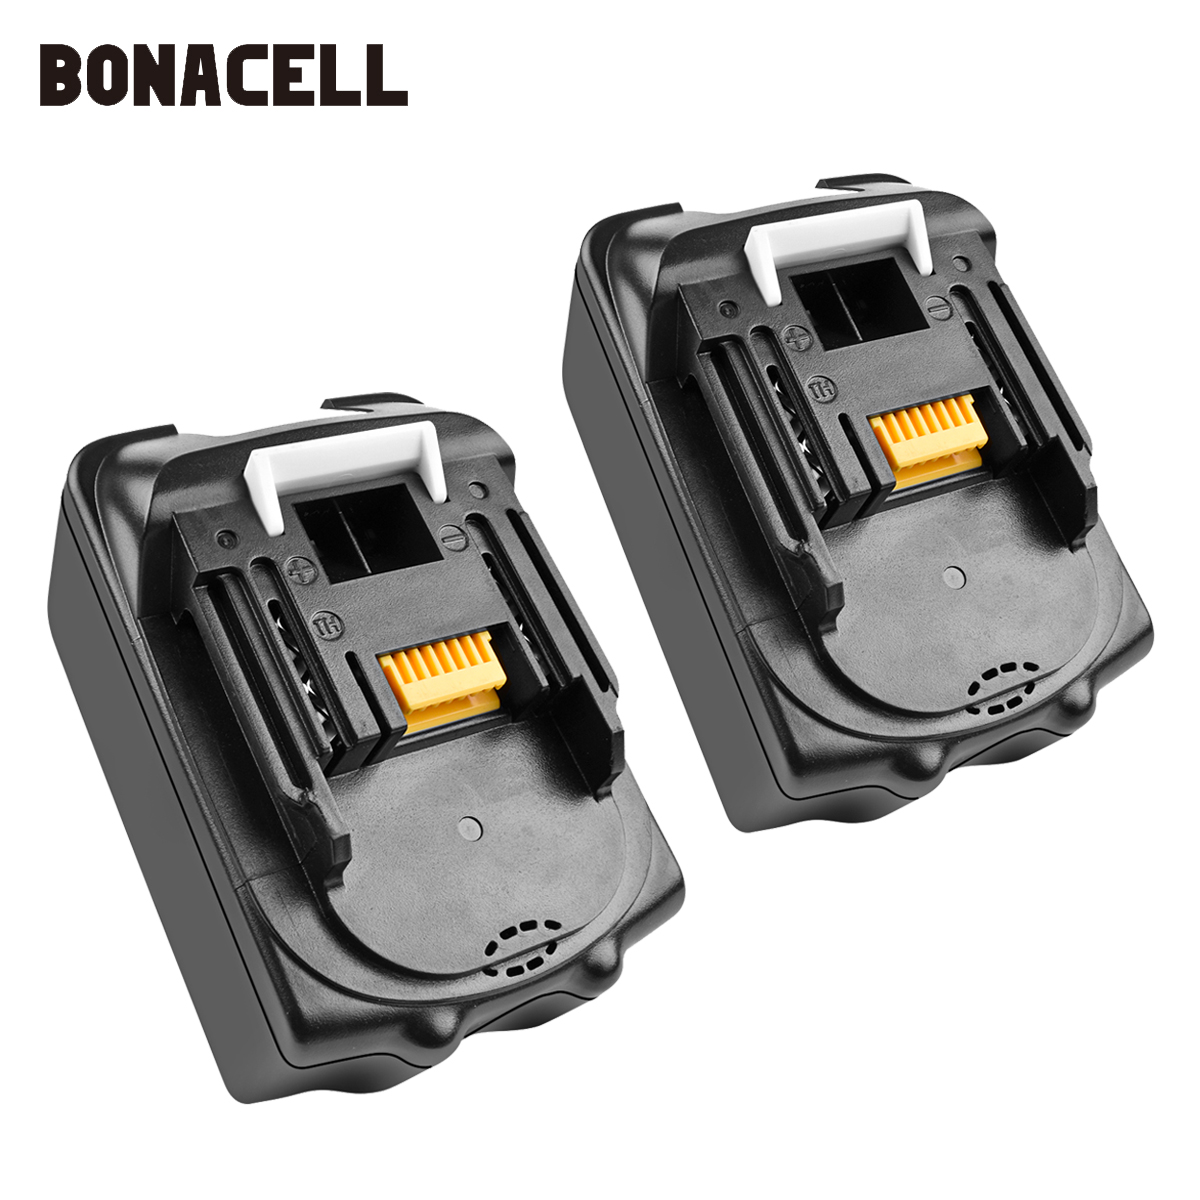 Bonacell 18V 4000mAh BL1830 Lithium Battery Pack Replacement for Makita Drill LXT400 194205-3 194309-1 BL1815 BL1840 BL1850 L30Bonacell 18V 4000mAh BL1830 Lithium Battery Pack Replacement for Makita Drill LXT400 194205-3 194309-1 BL1815 BL1840 BL1850 L30